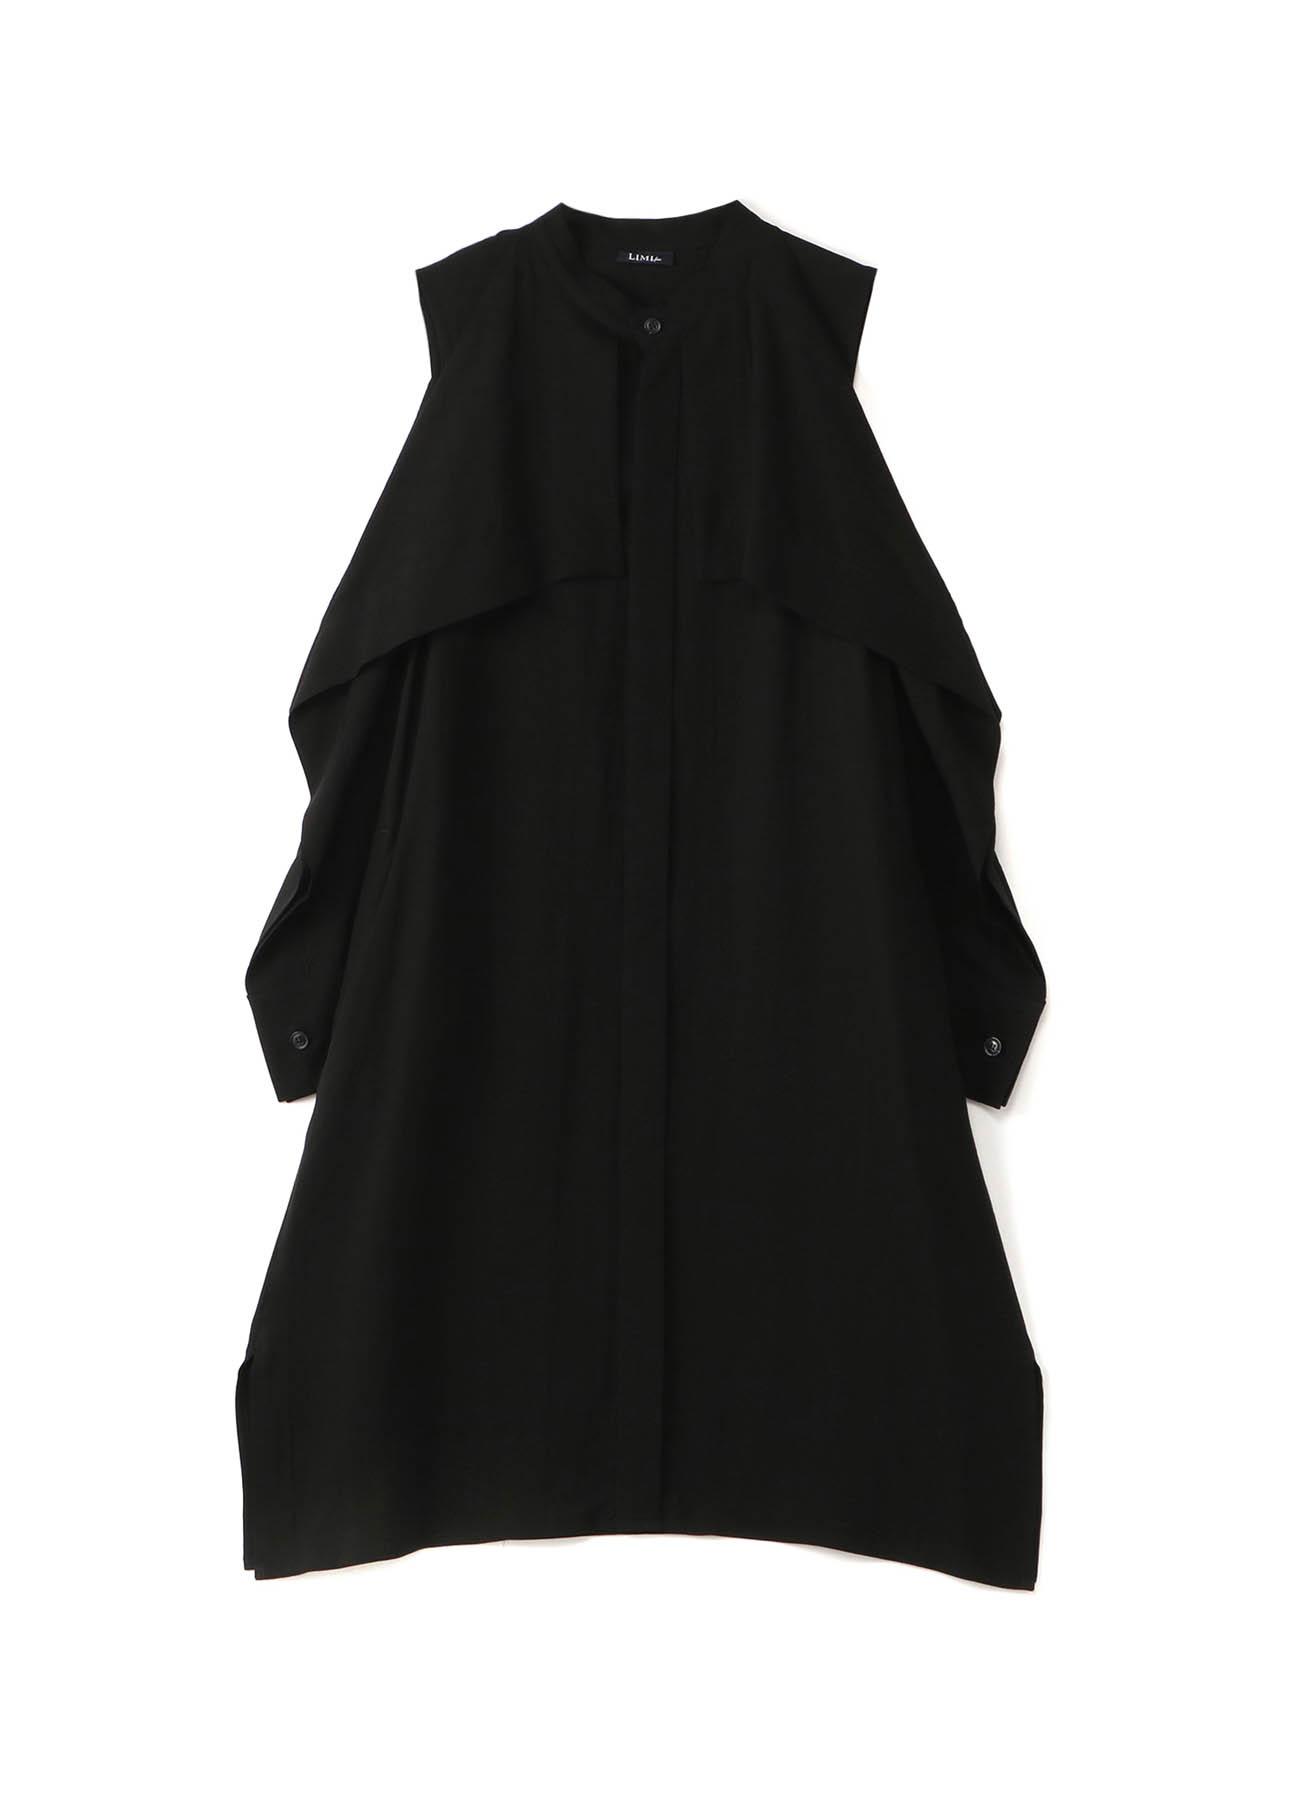 Ten/Cu Tussah Square Sleeve Dress